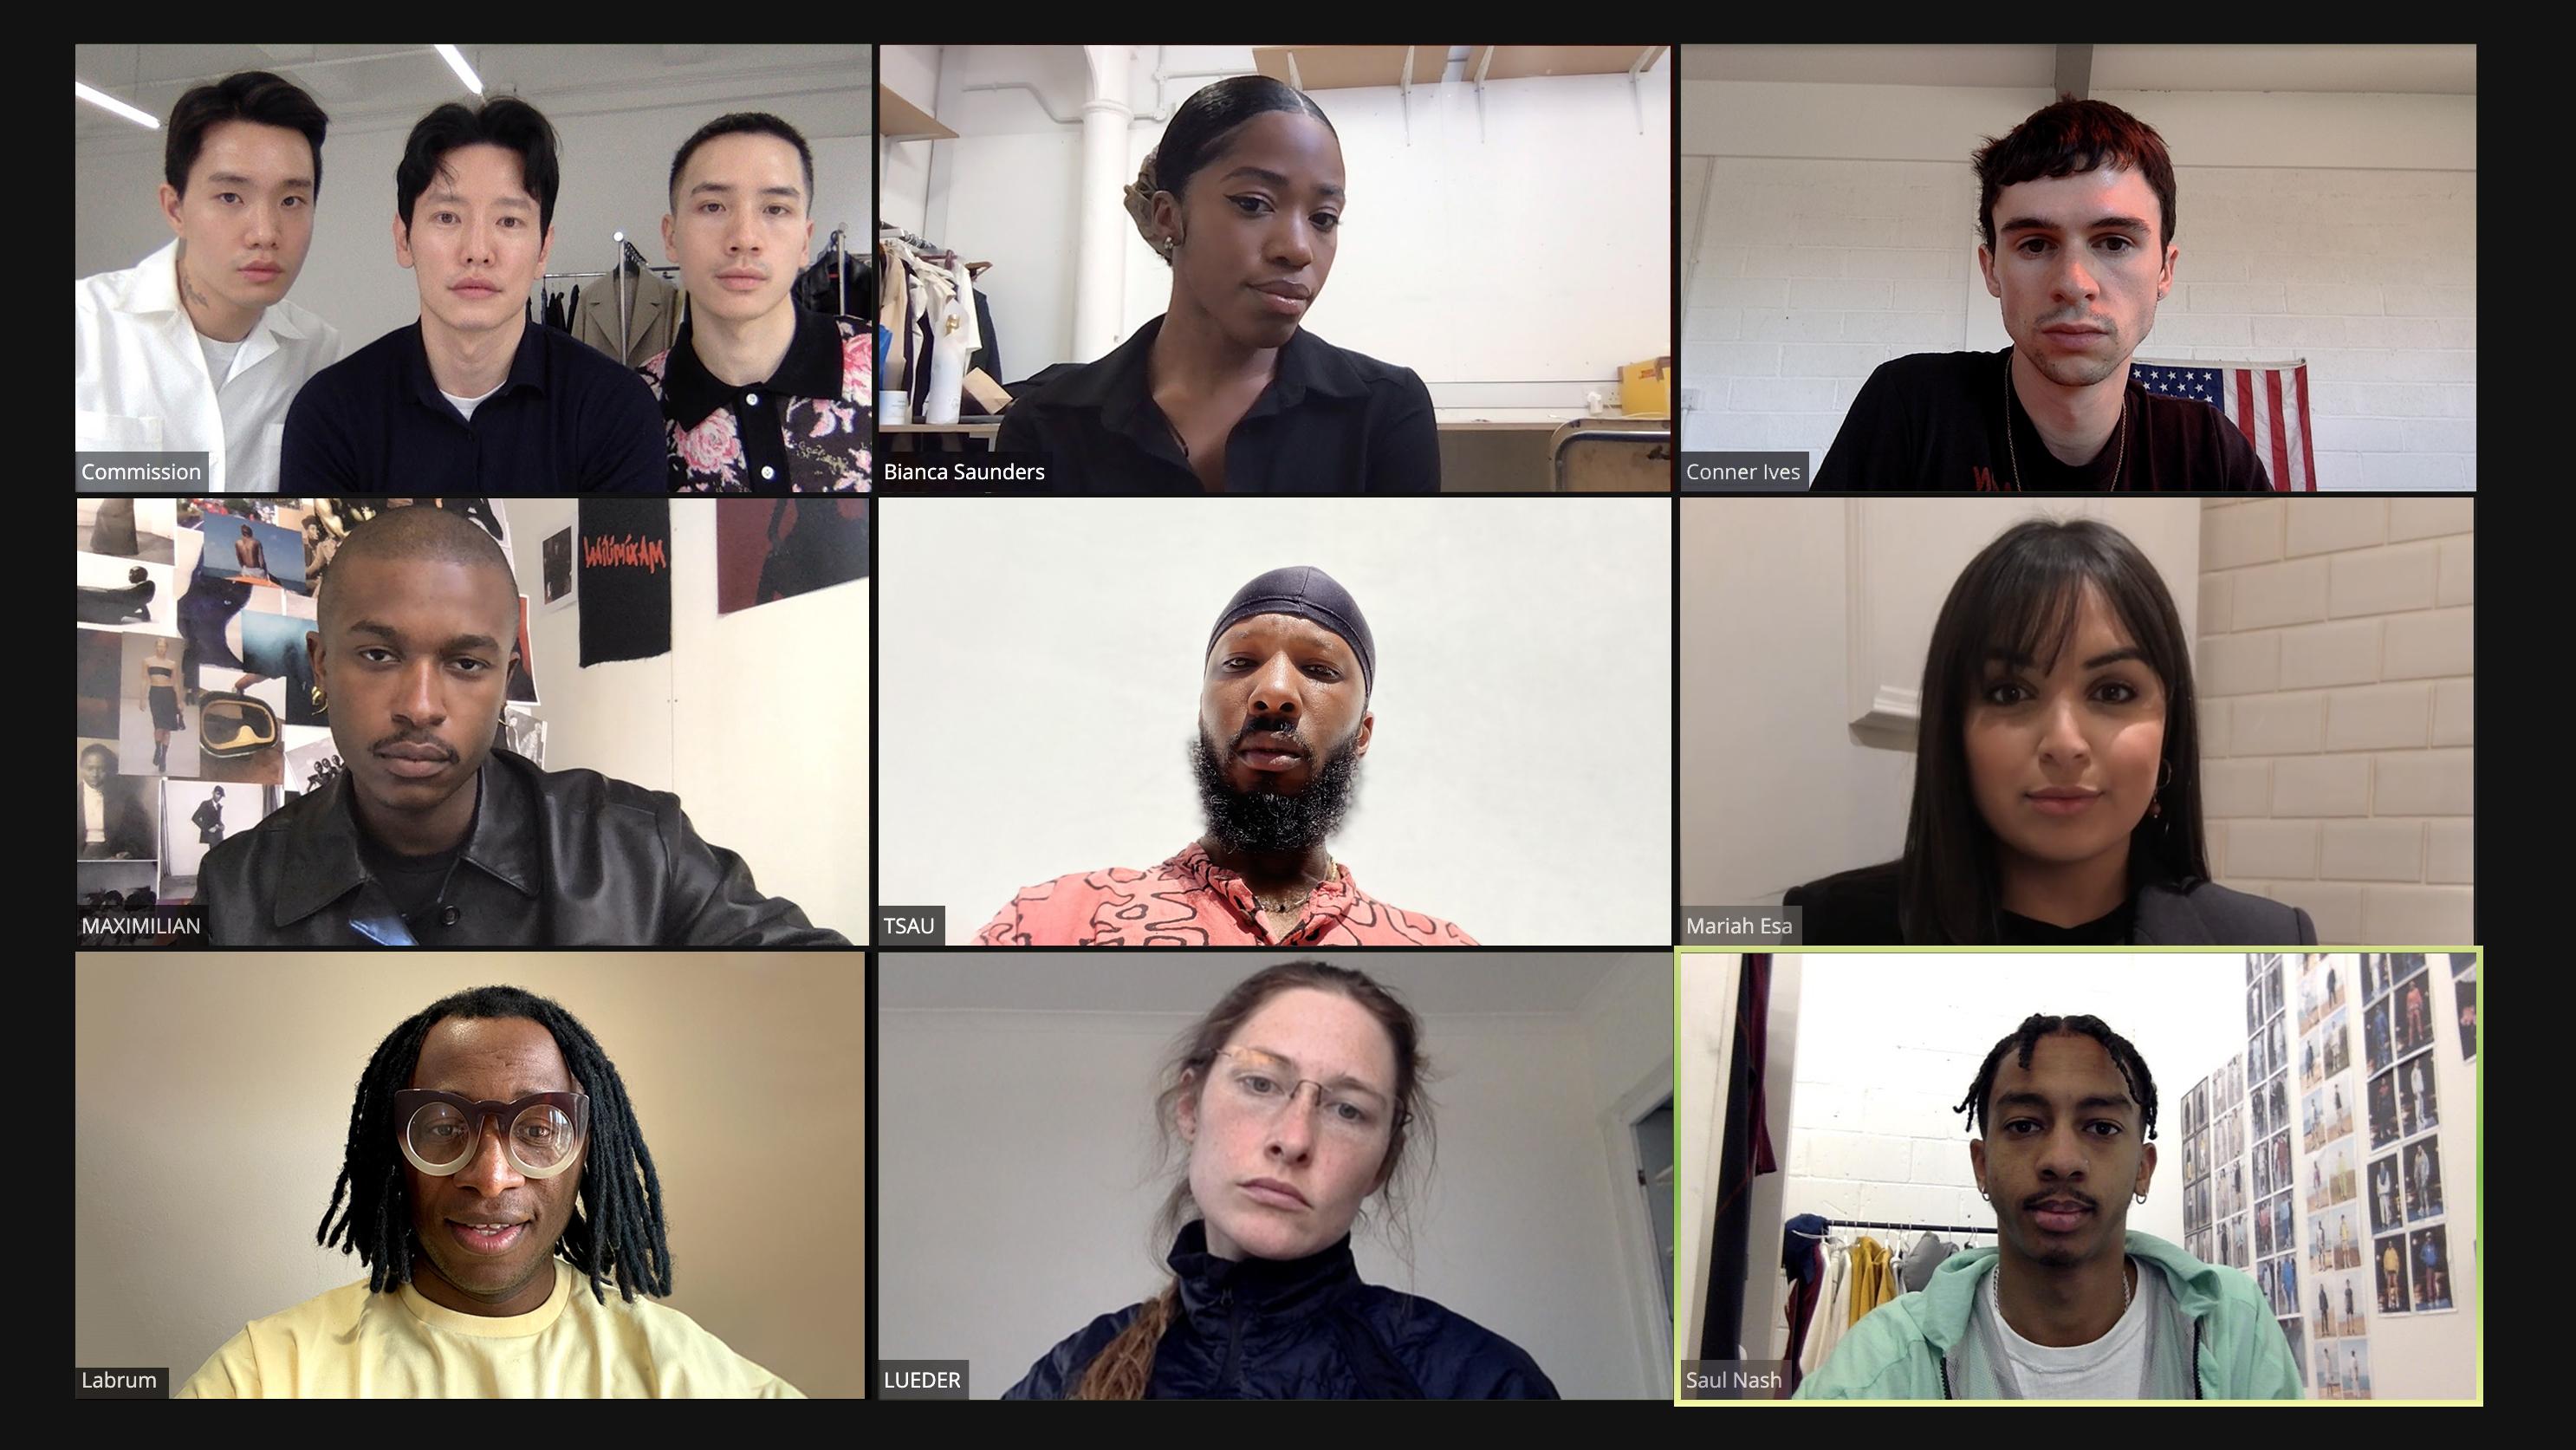 Browns Focus Series One featuring Conner Ives, Maximilian, Mariah Esa, Commission, Bianca Saunders, Labrum, Ludeur, Saul Nash and Tsau Store.